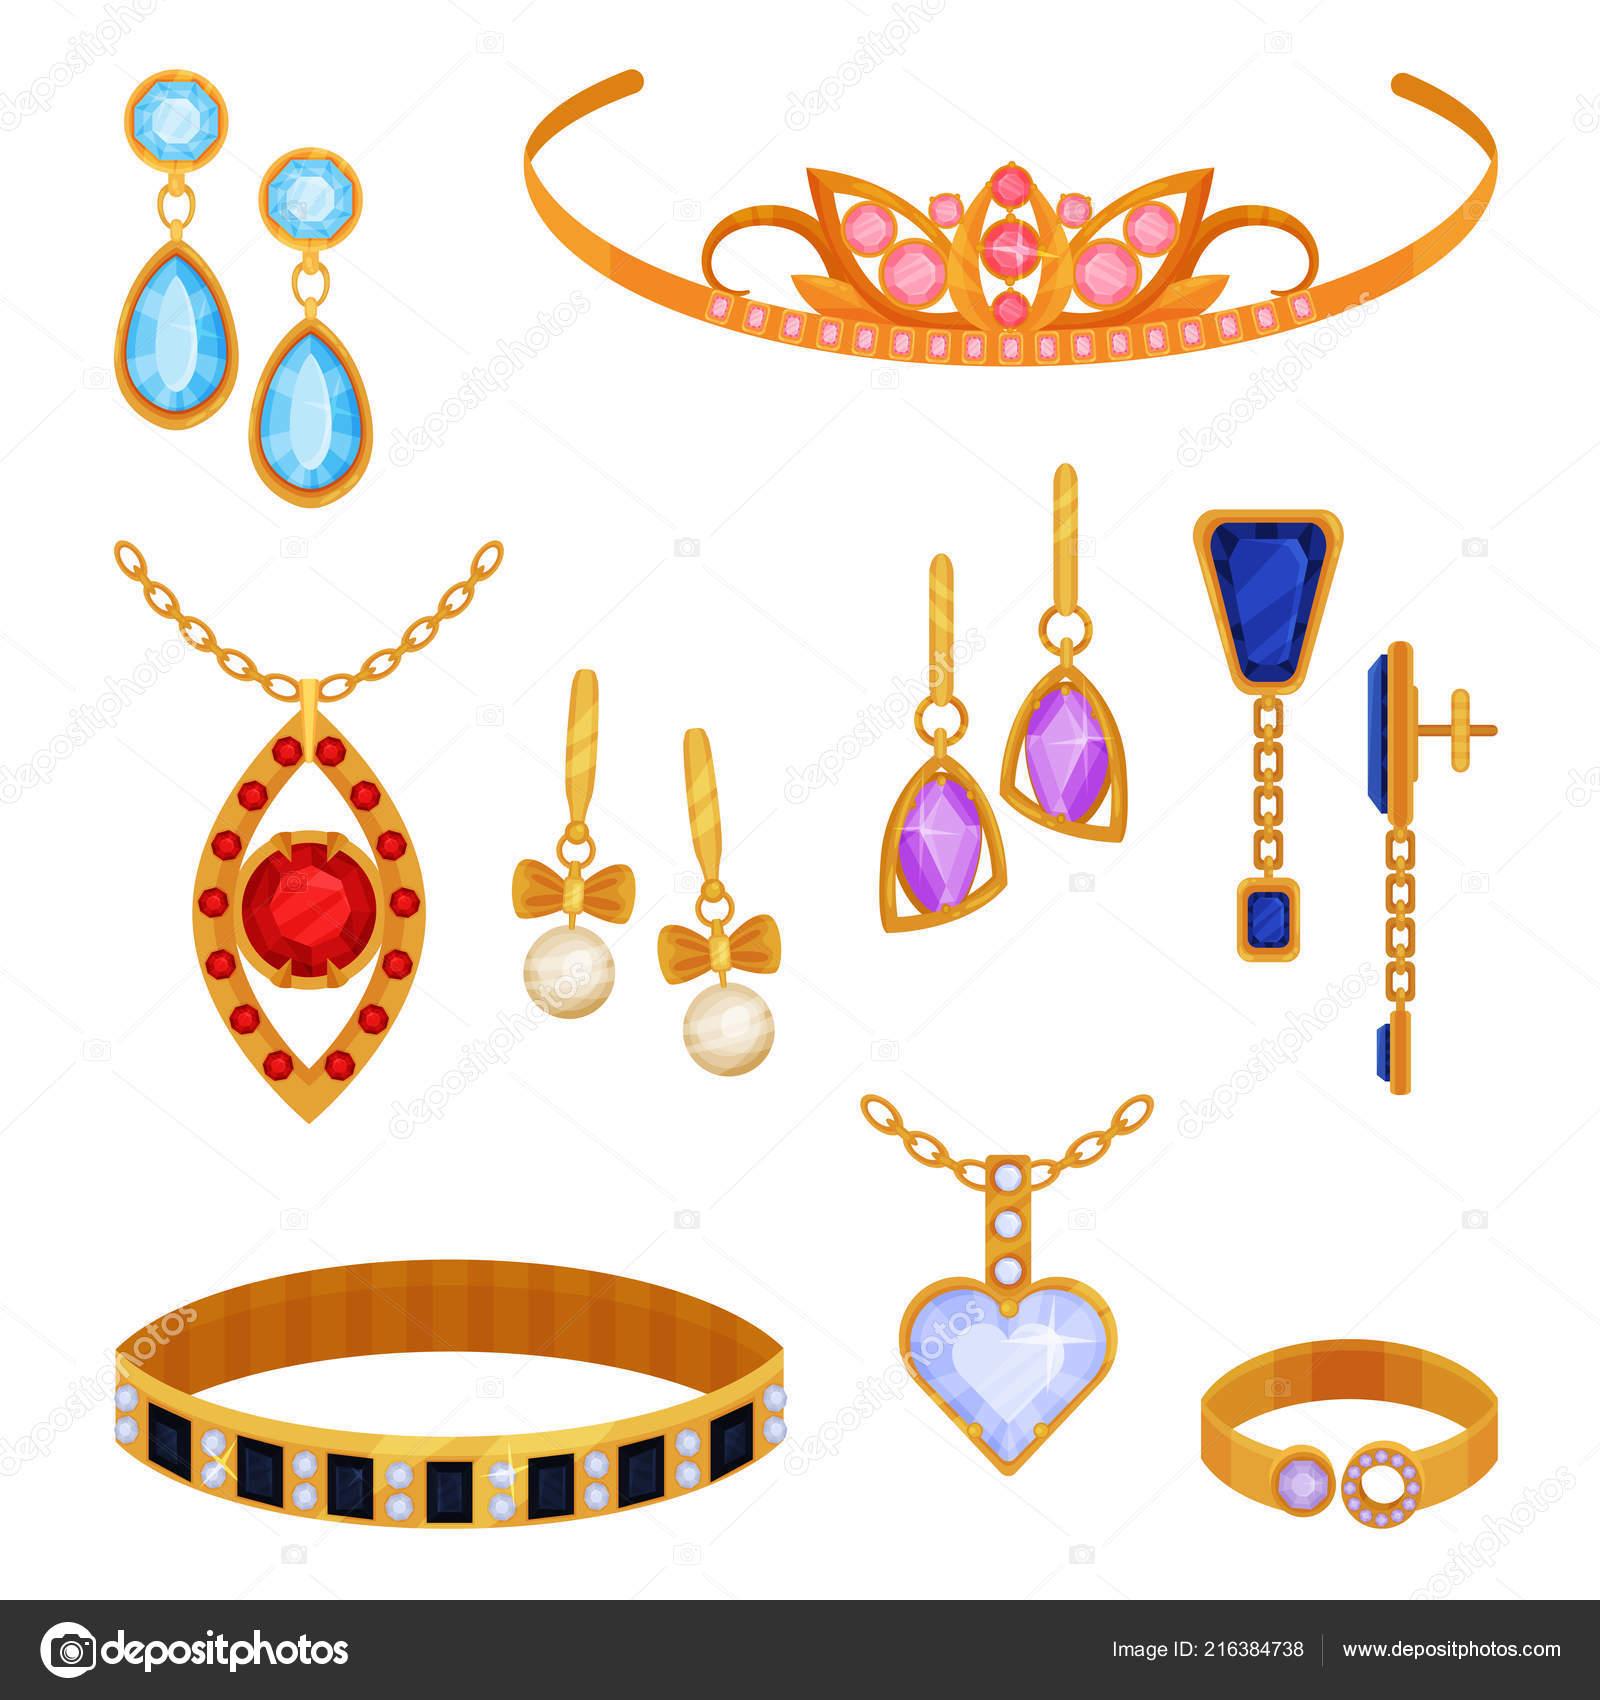 91cea8eee15e Conjunto Hermosas Joyas Oro Moda Tiara Collar Pulsera Cadena Oro ...